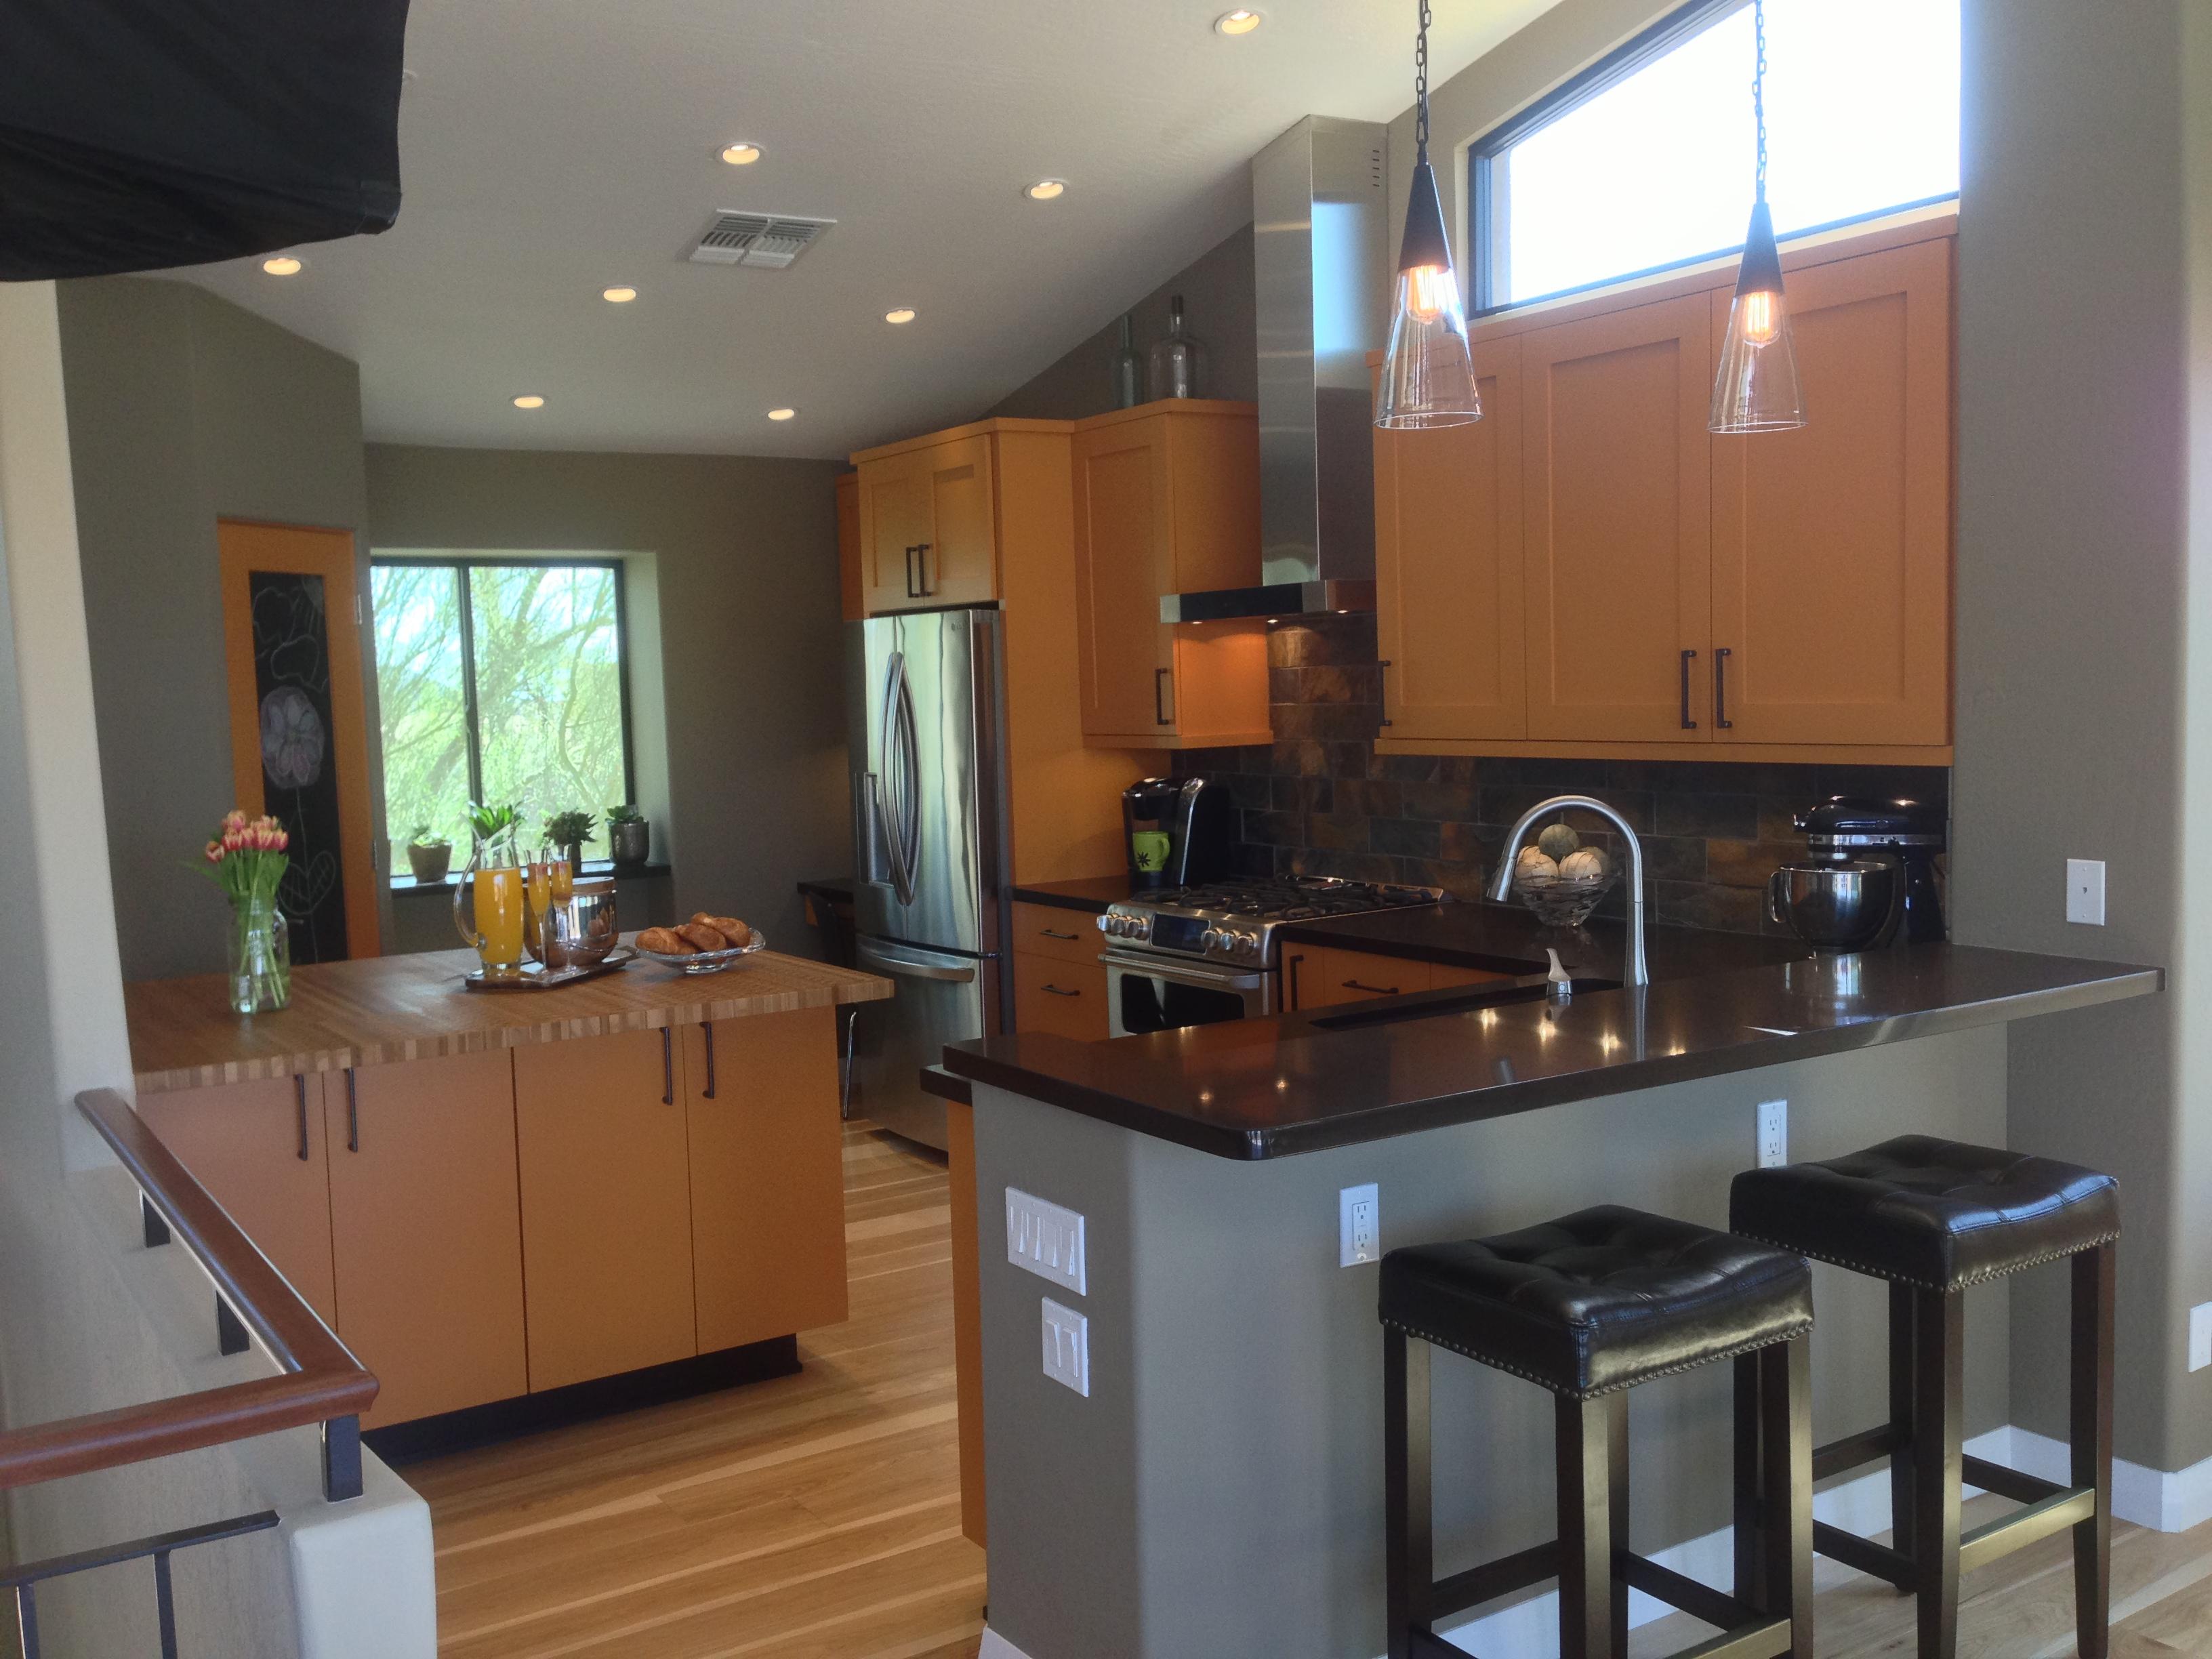 Granite Countertops for Kitchen Remodeling in Scottsdale on Black Countertops  id=92644